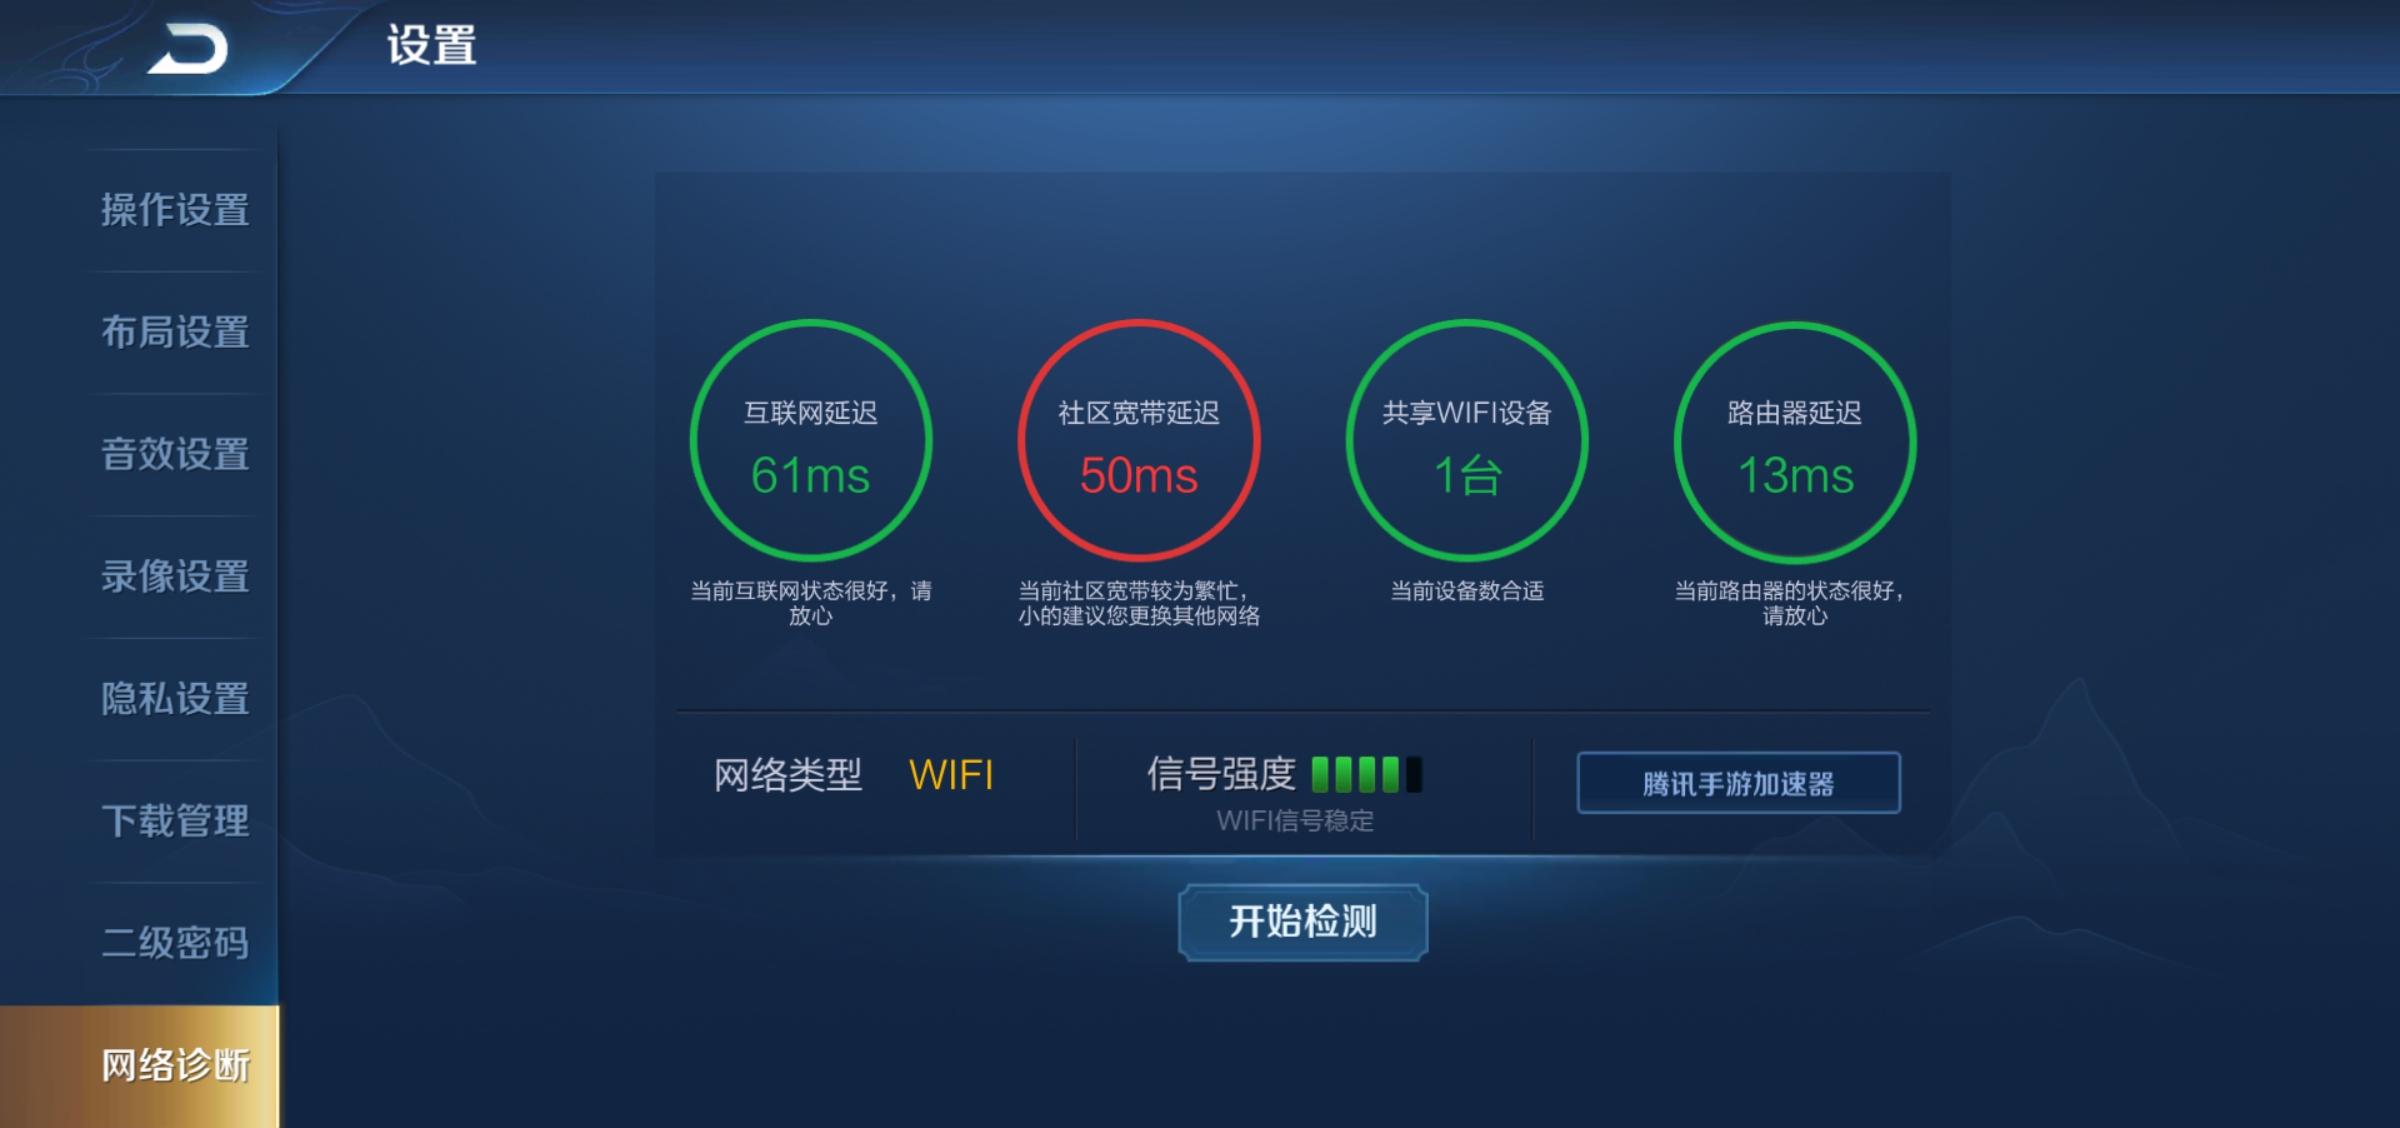 Screenshot_20200507_154544_com.tencent.tmgp.sgame.jpg